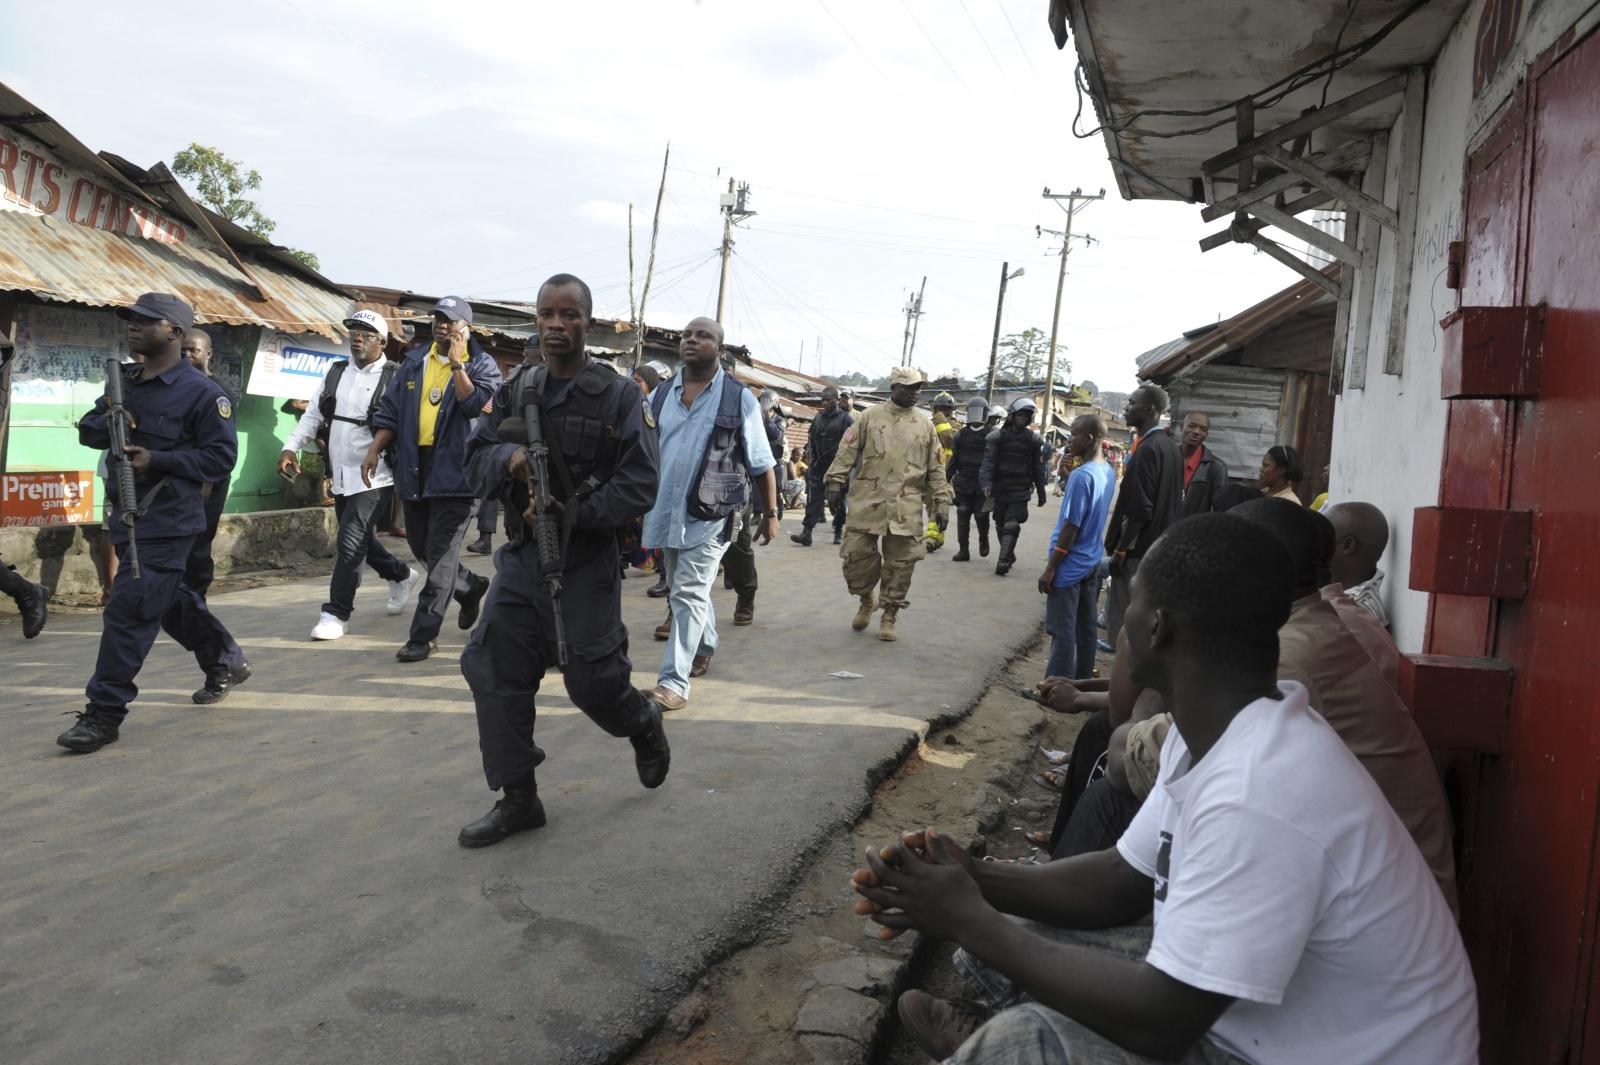 LIBERIA.FORCES